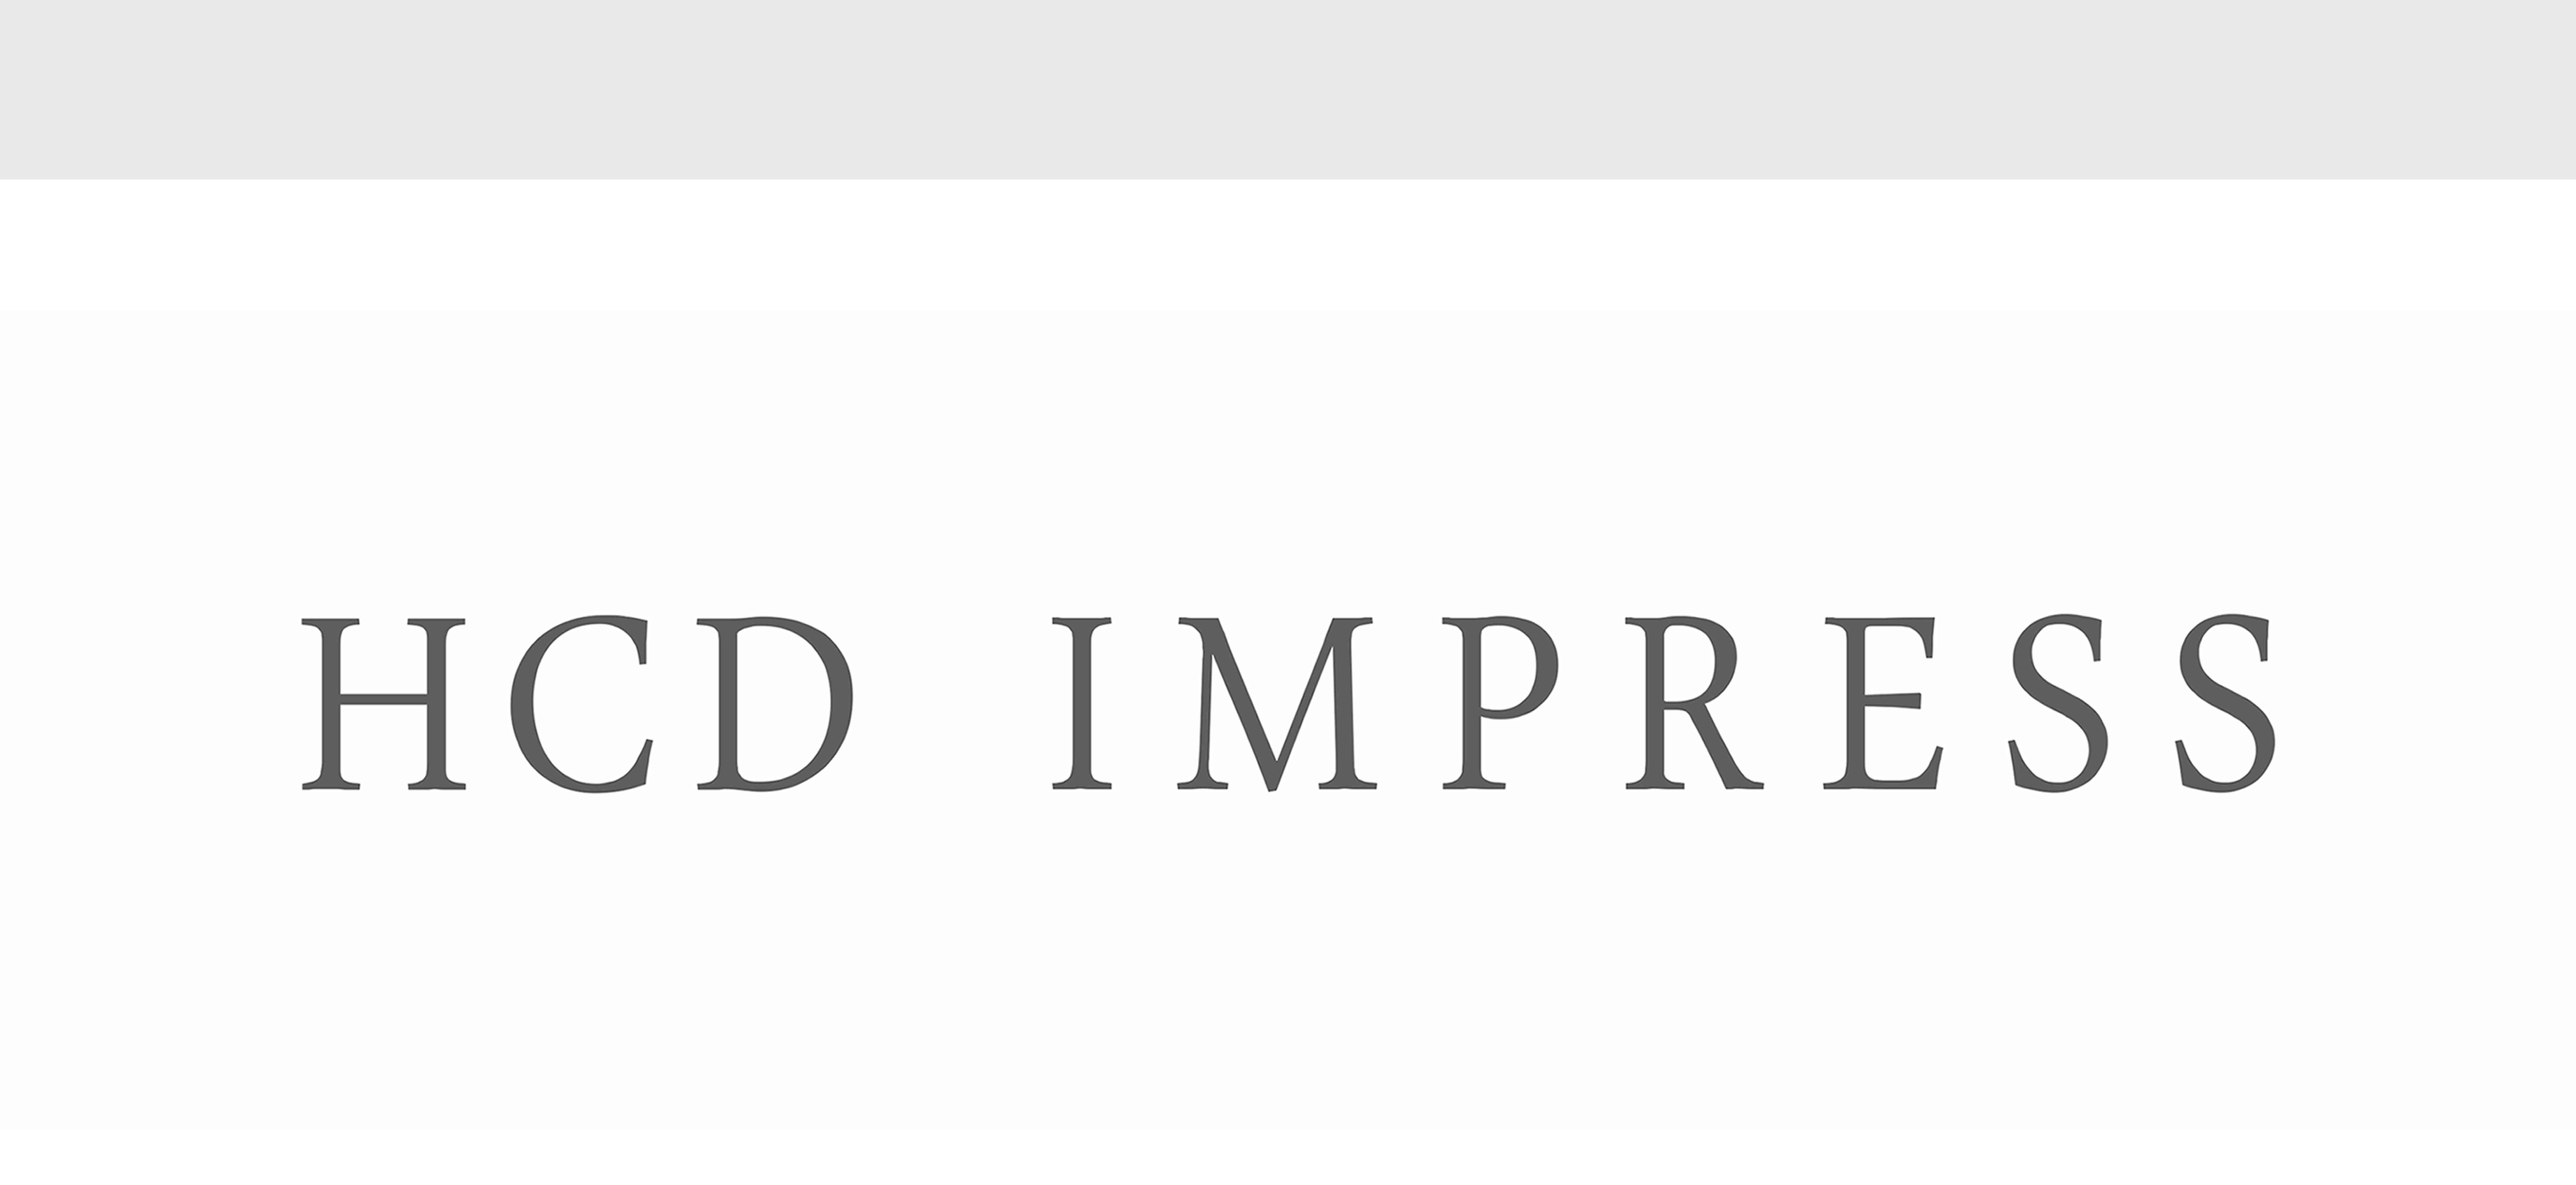 HCD IMPRESS 柏年印象